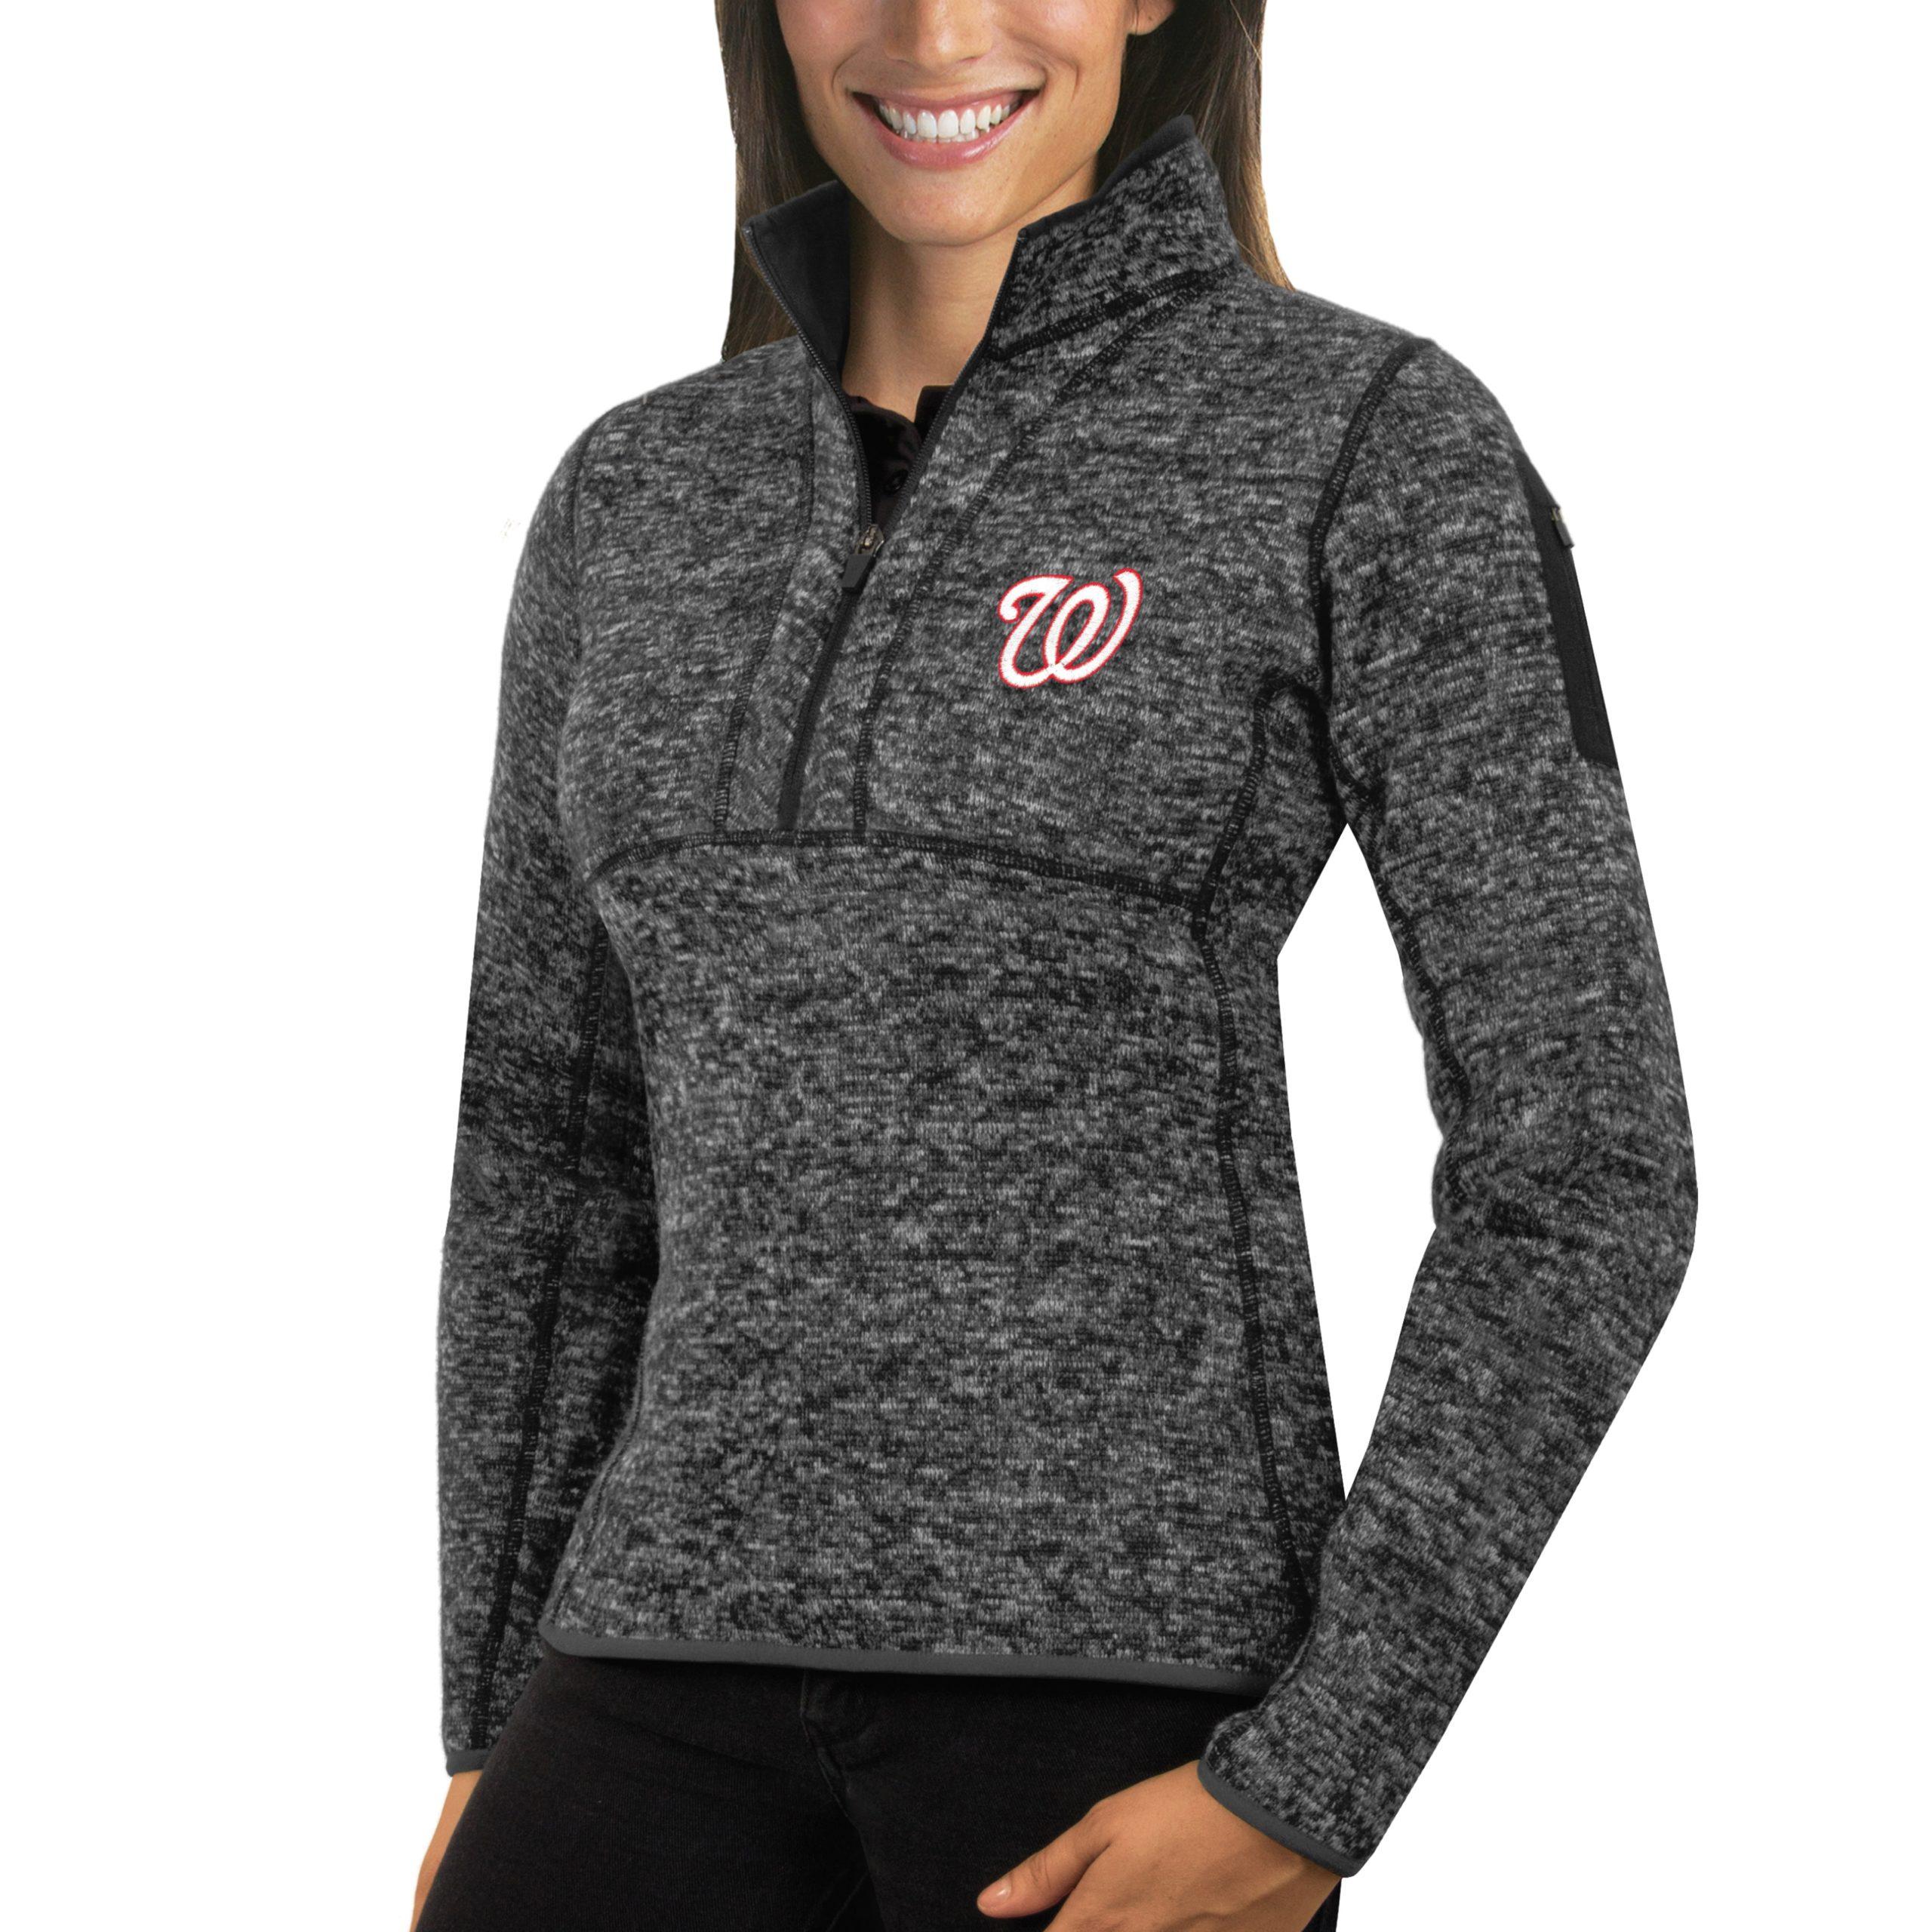 Washington Nationals Antigua Women's Fortune Half-Zip Pullover Sweater - Heathered Charcoal